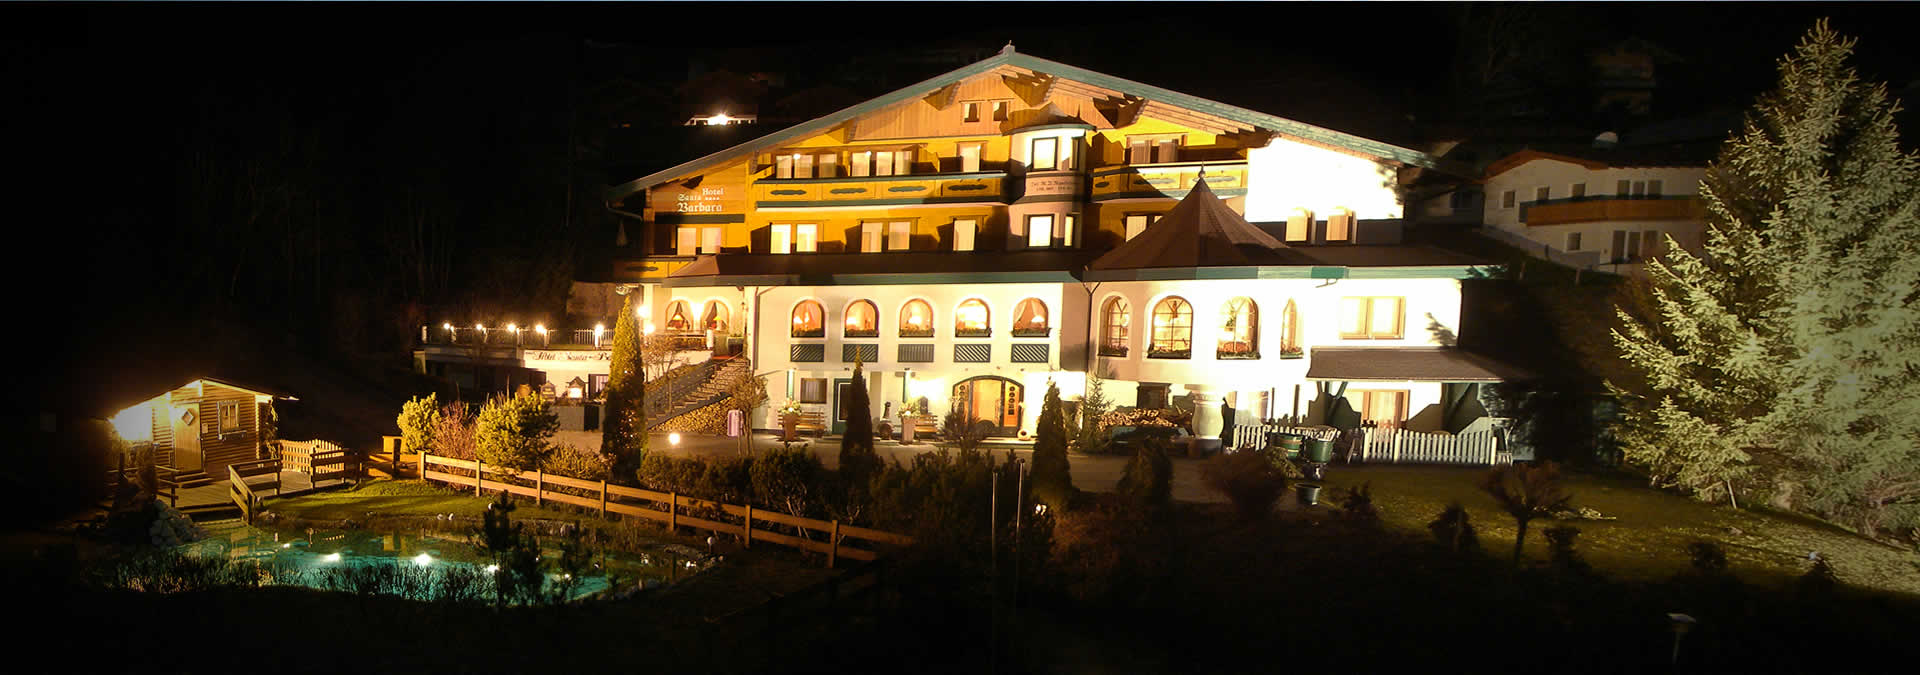 Urlaub in Flachau - Hotel Santa Barbara - direkt an der Piste